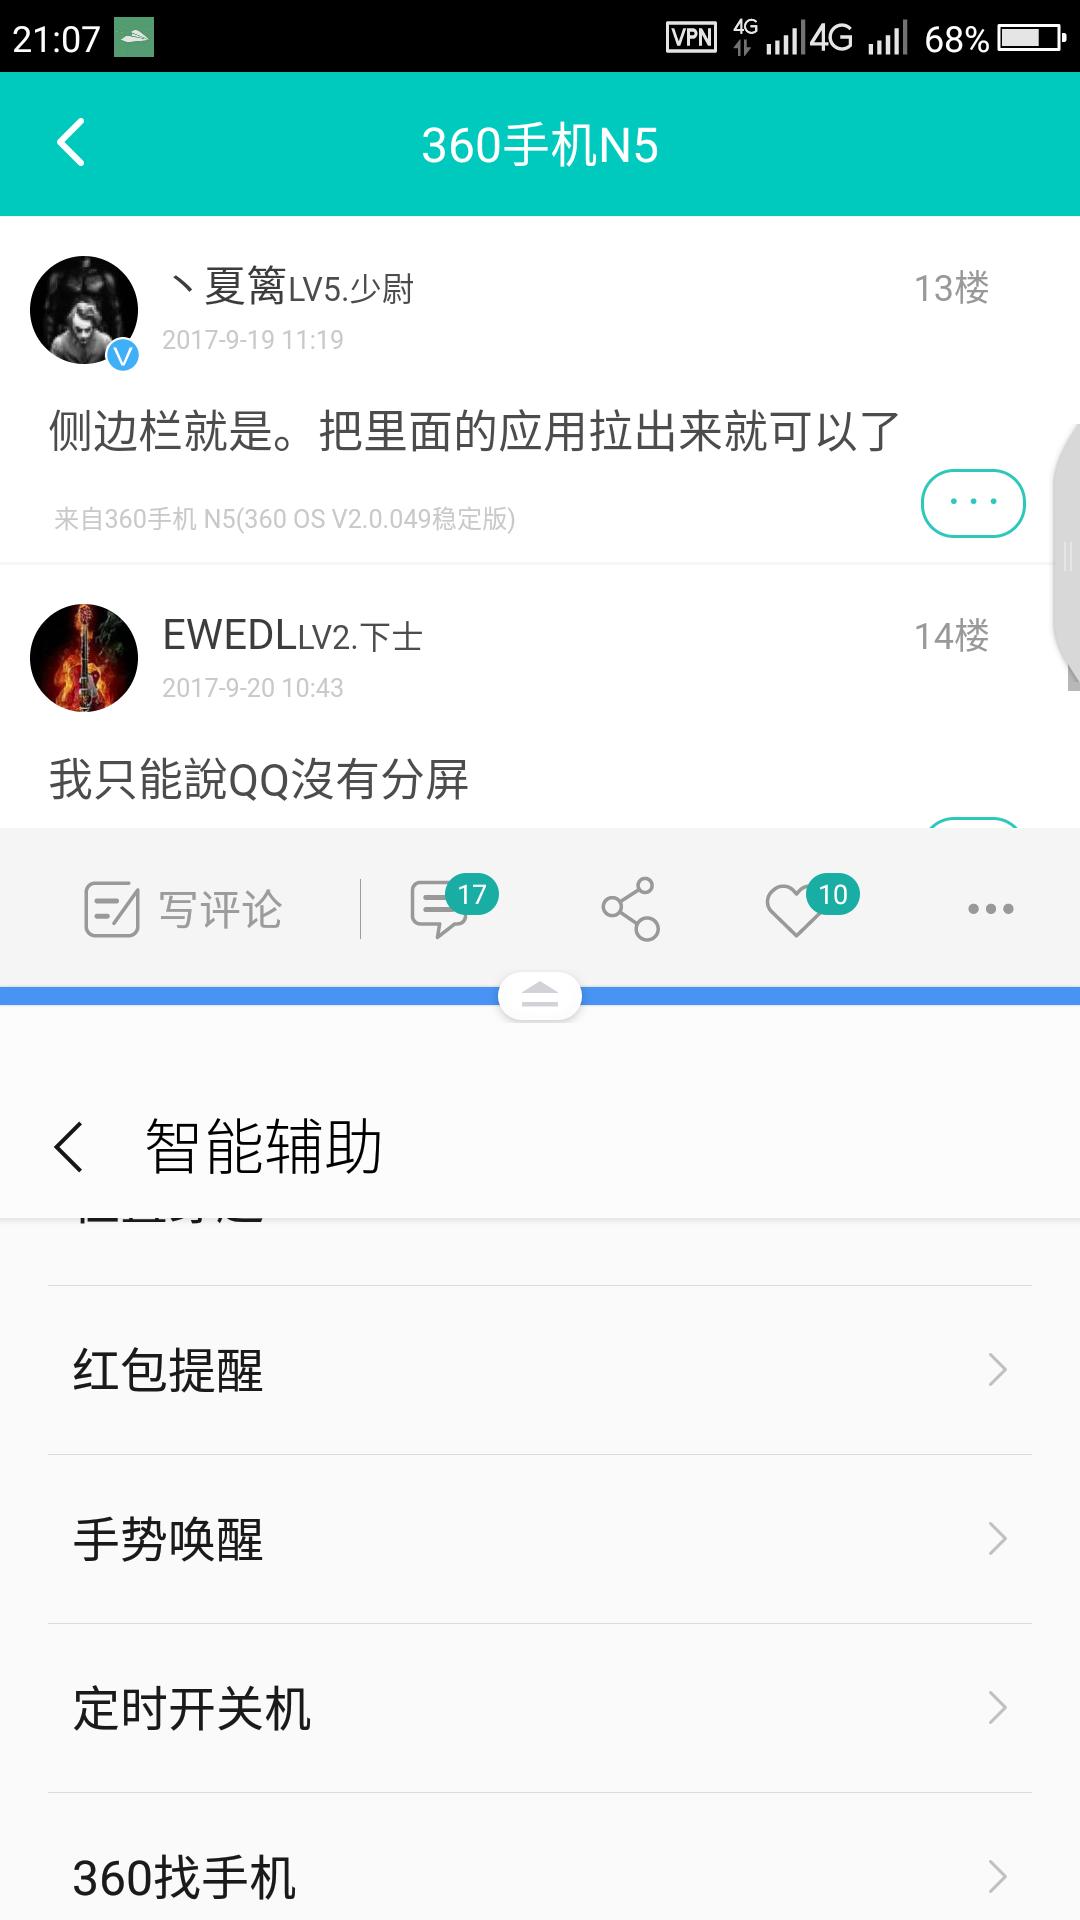 Screenshot_2017-10-11-21-08-02.png